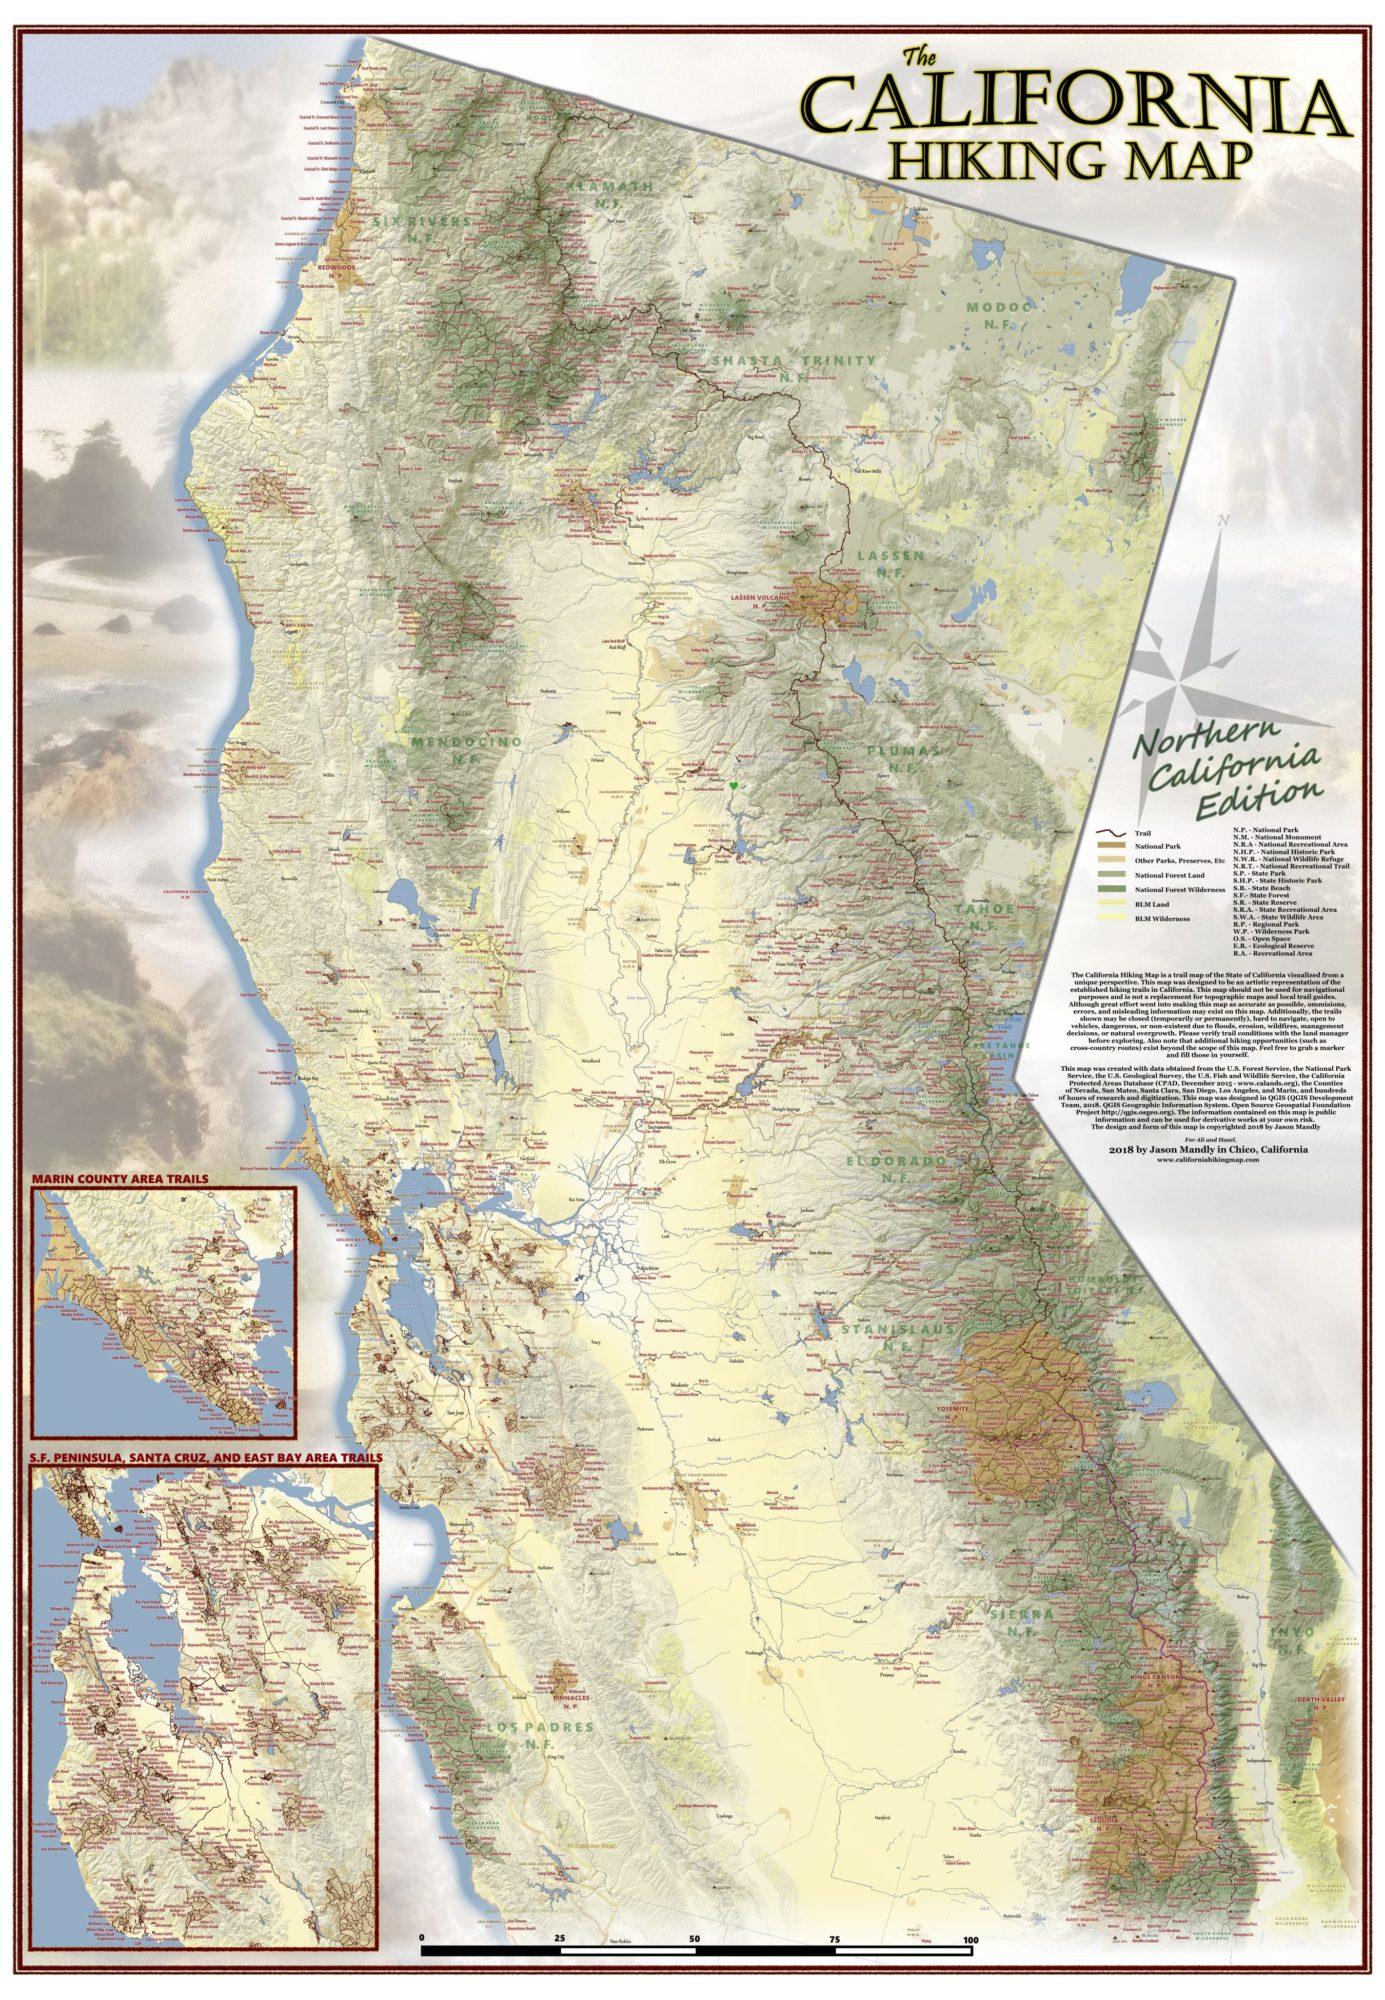 California Hiking Map - California Hiking Trails Map